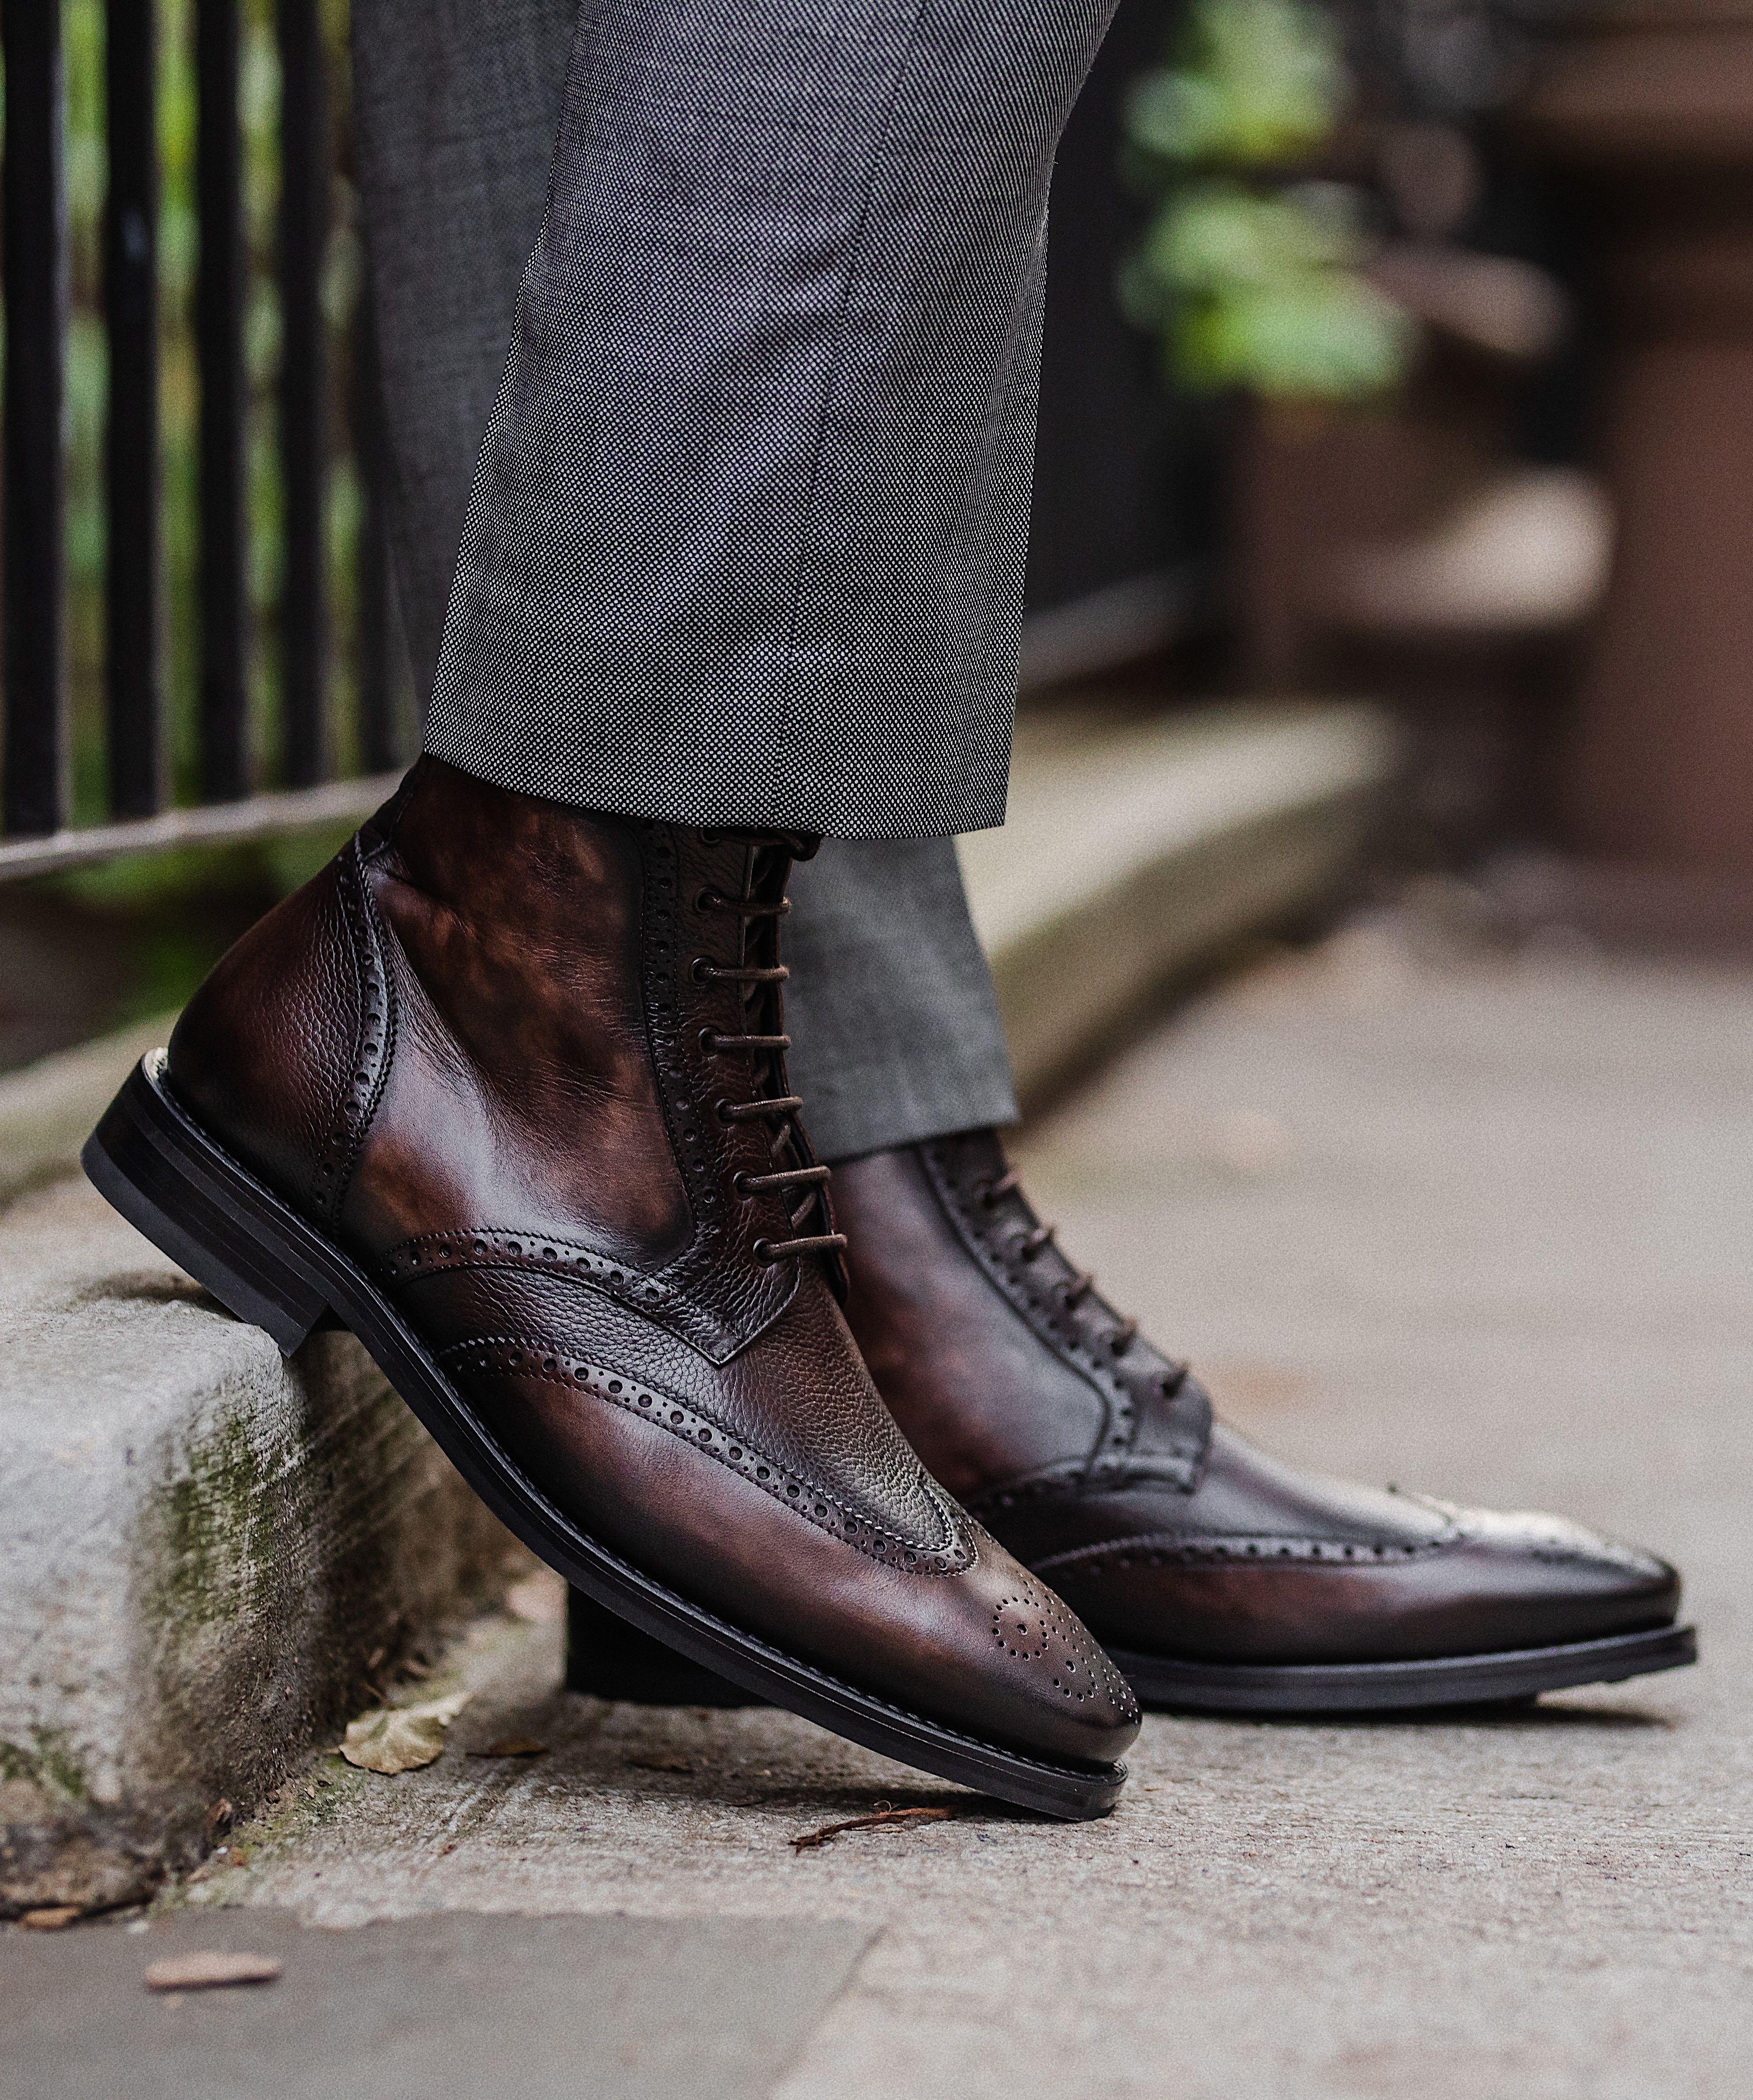 Mens wingtip boots